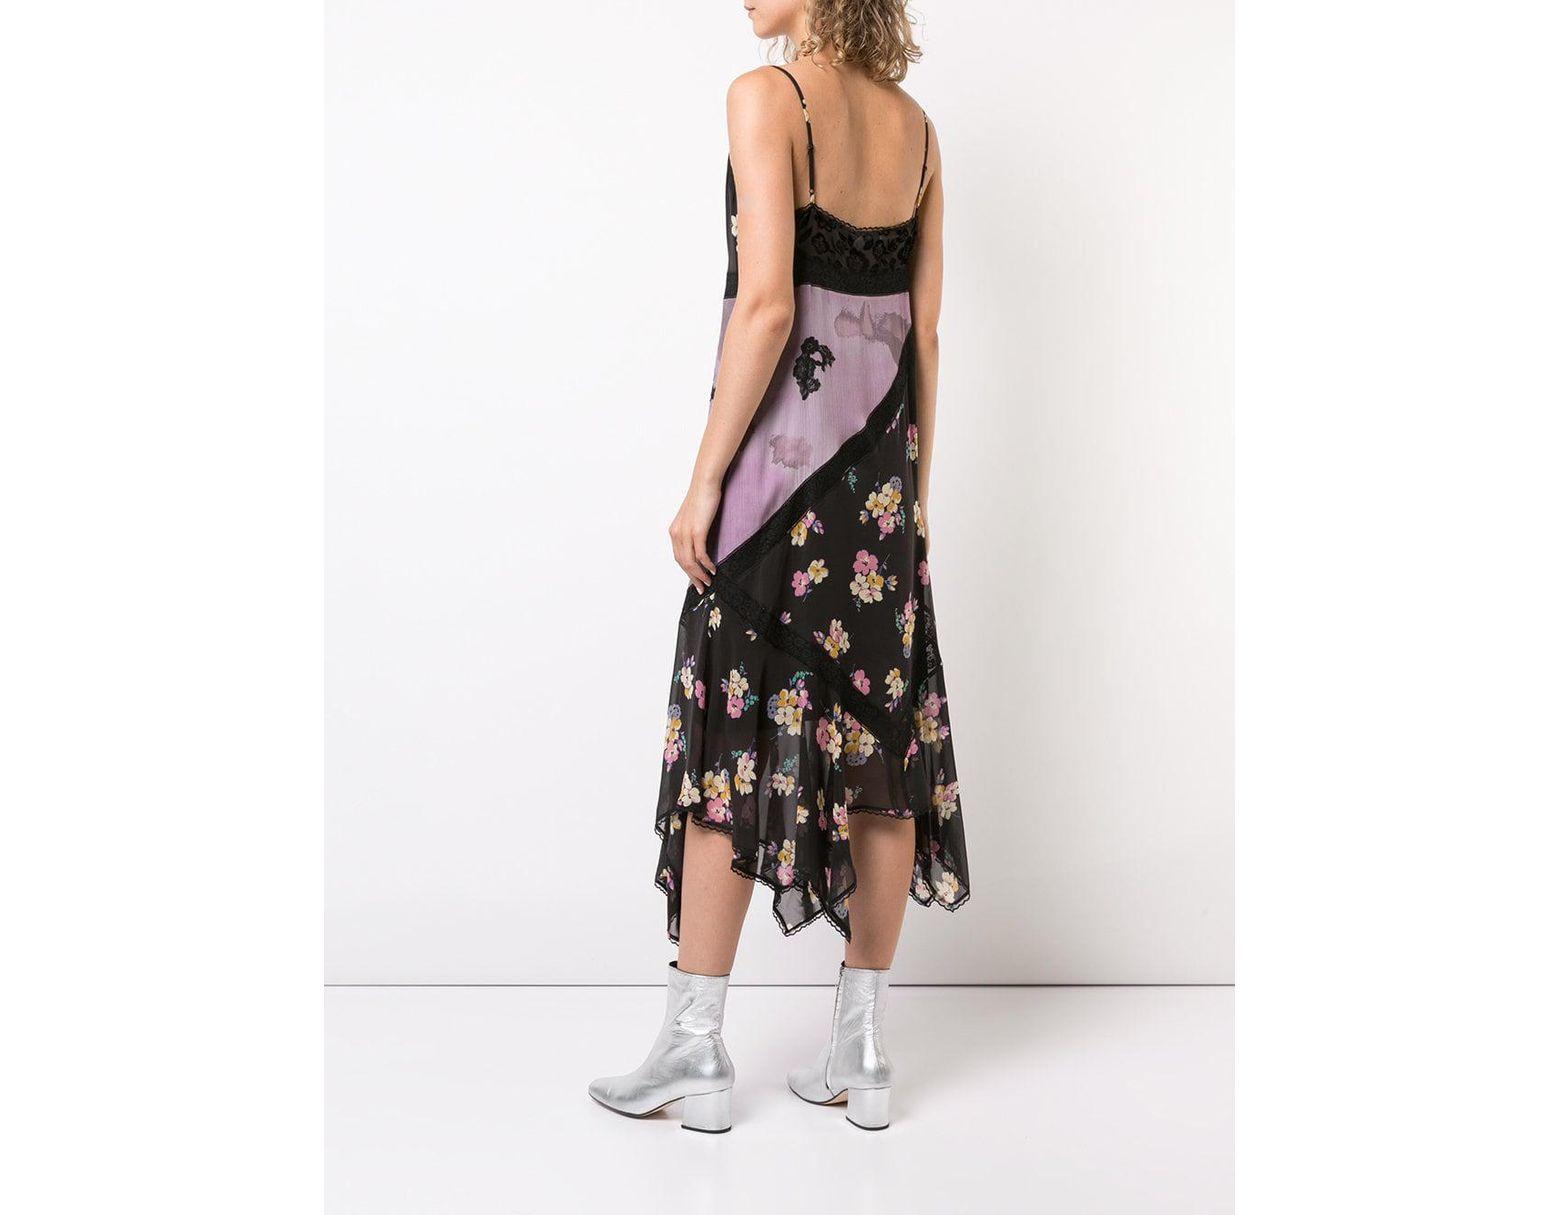 efb1c0de98 COACH Mixed Print Slip Dress in Pink - Lyst